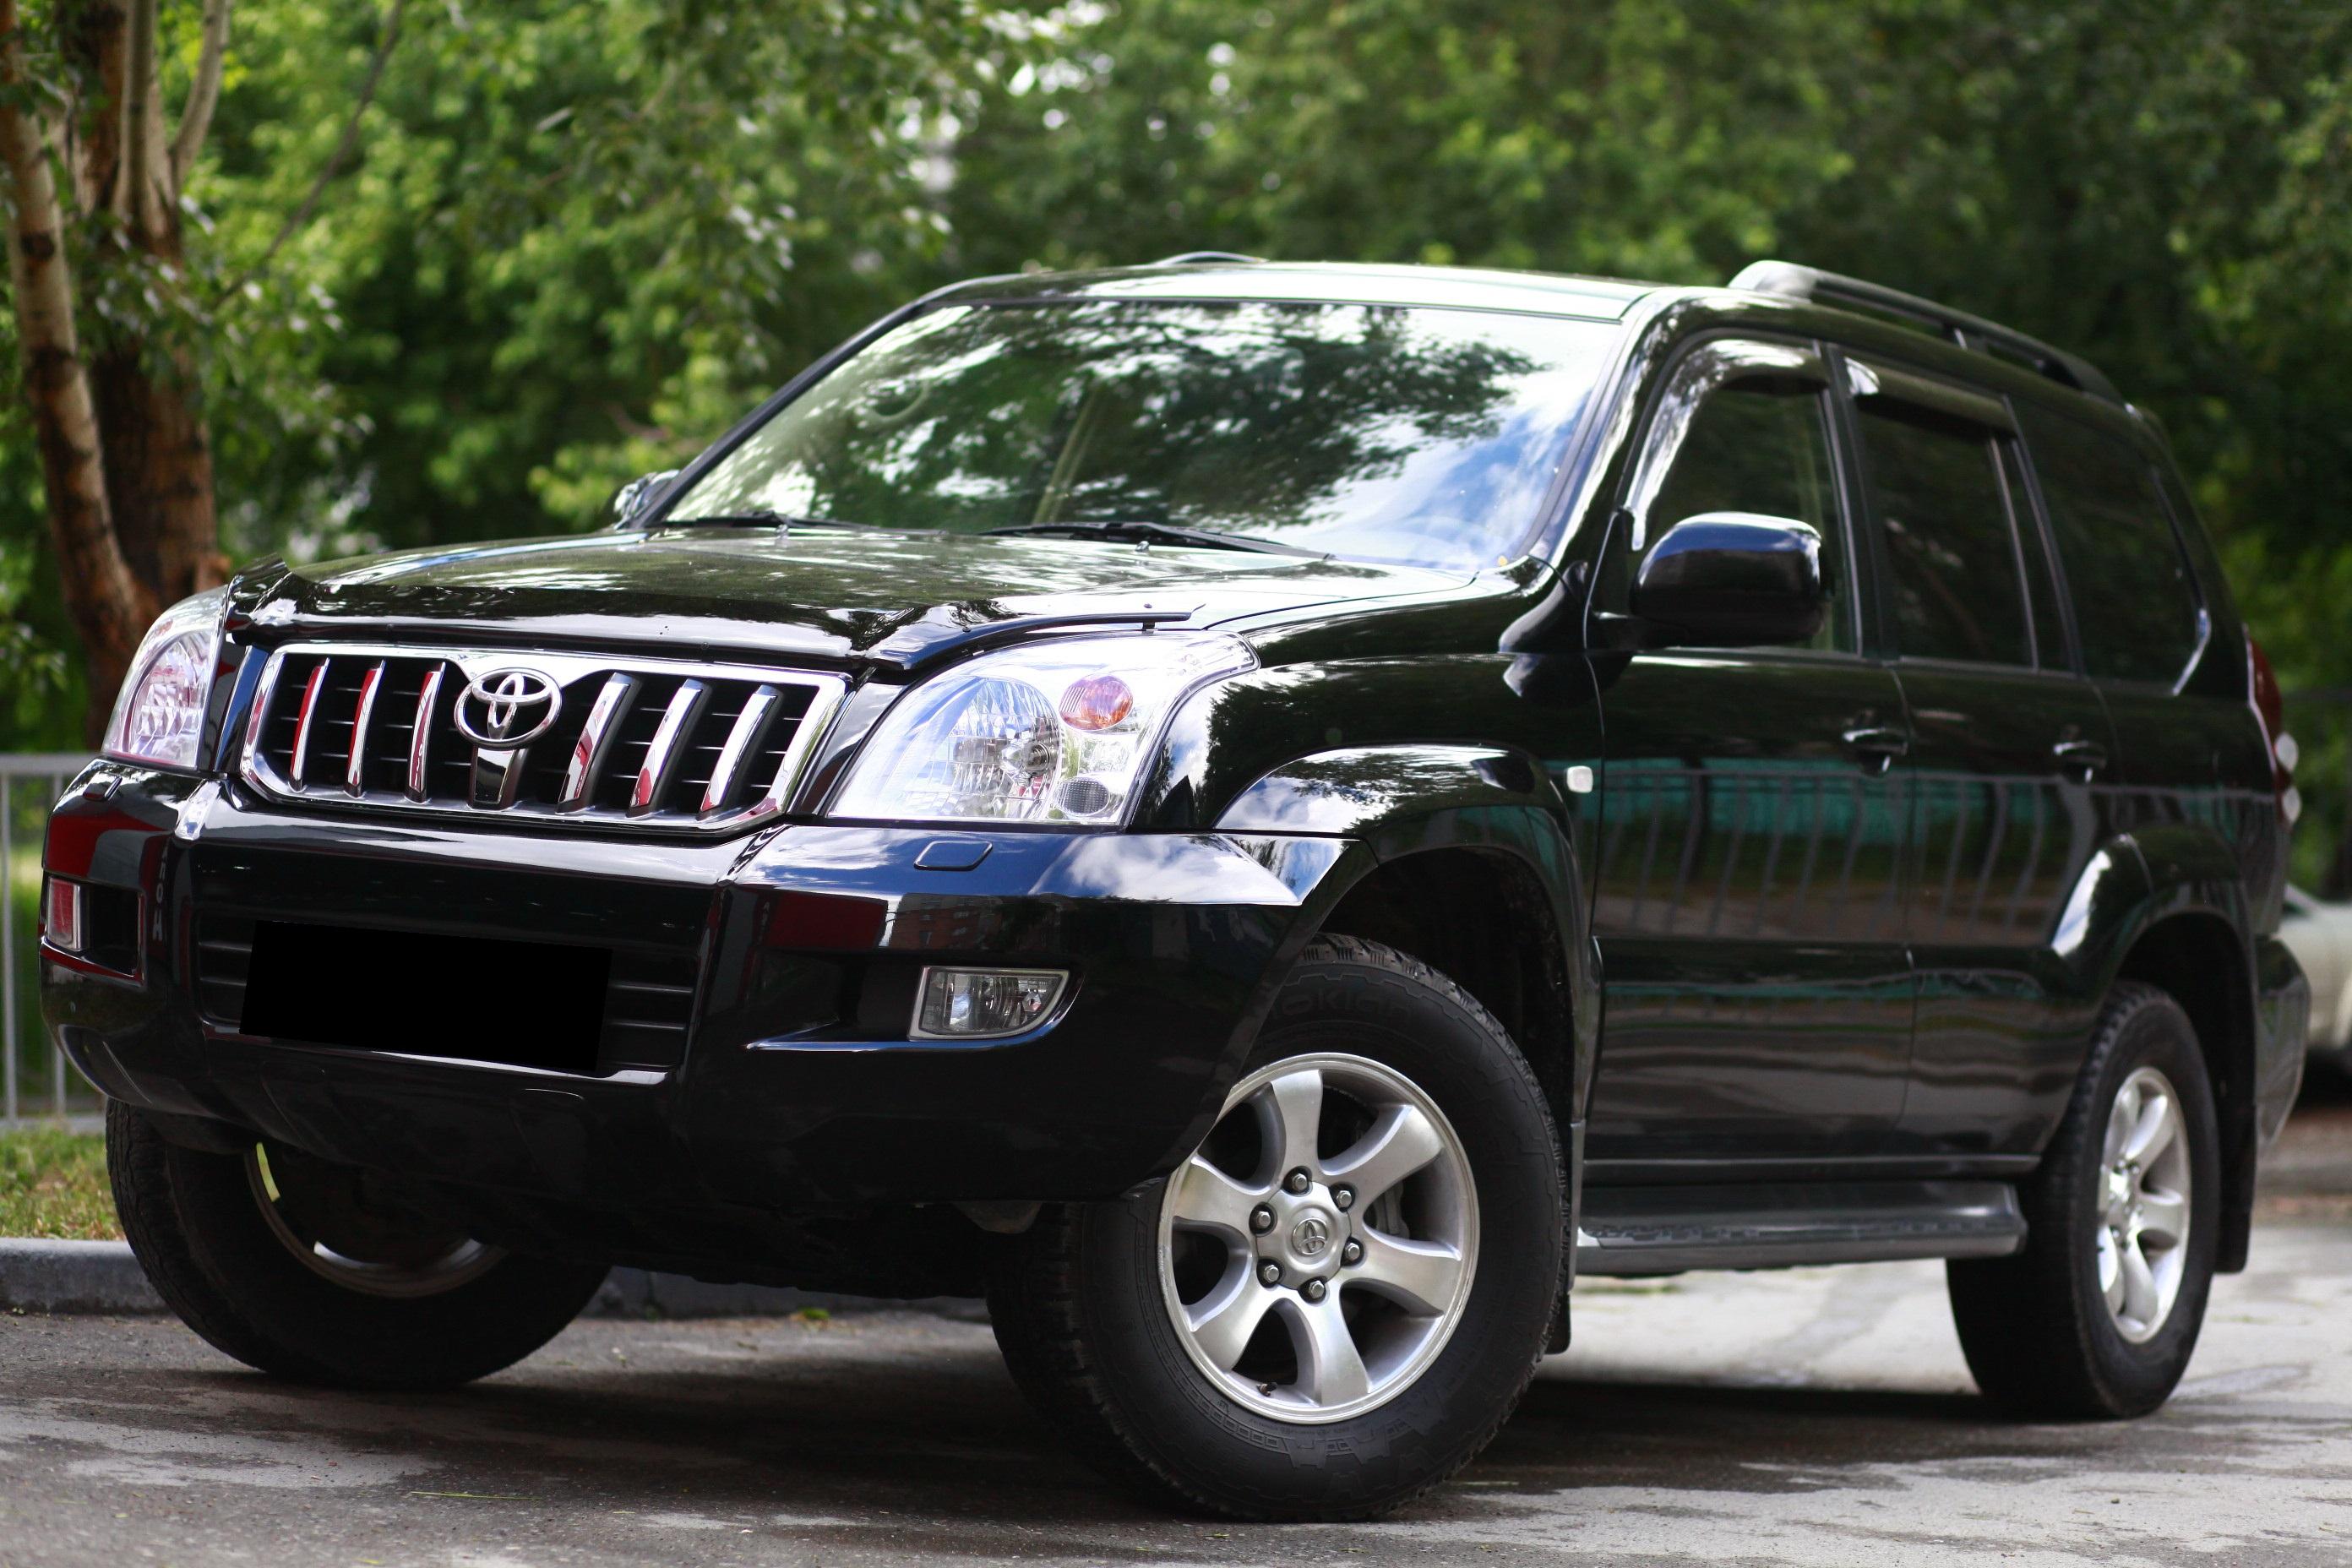 Toyota Land Cruiser Prado 1 630 000 руб